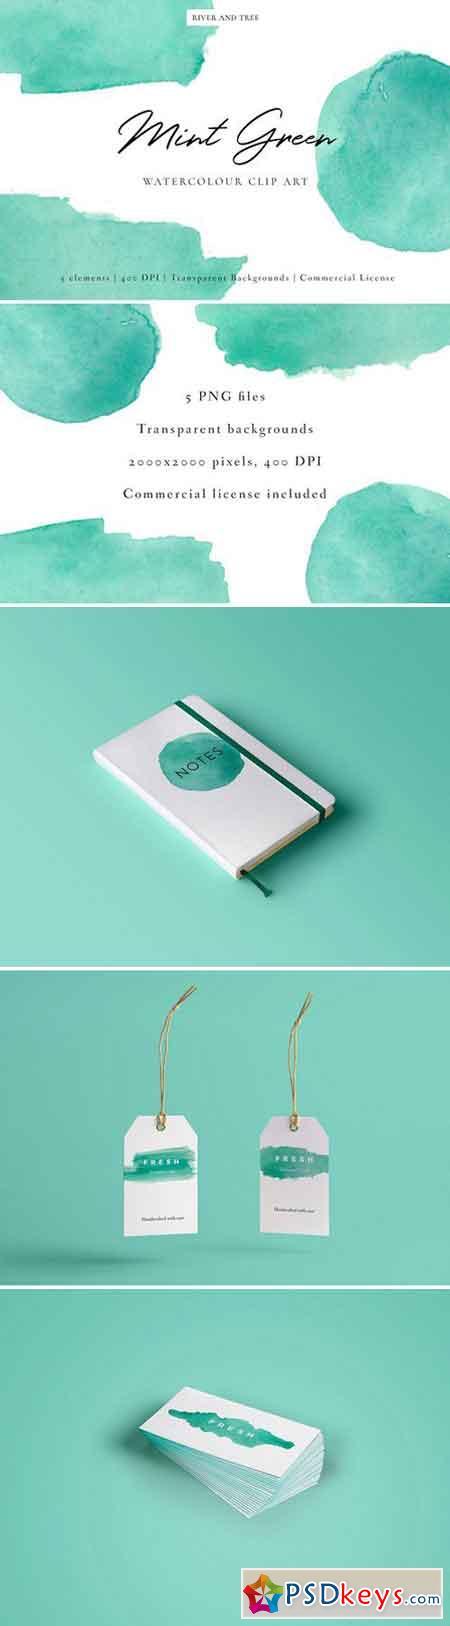 Mint Green Watercolour Clip Art 2232257